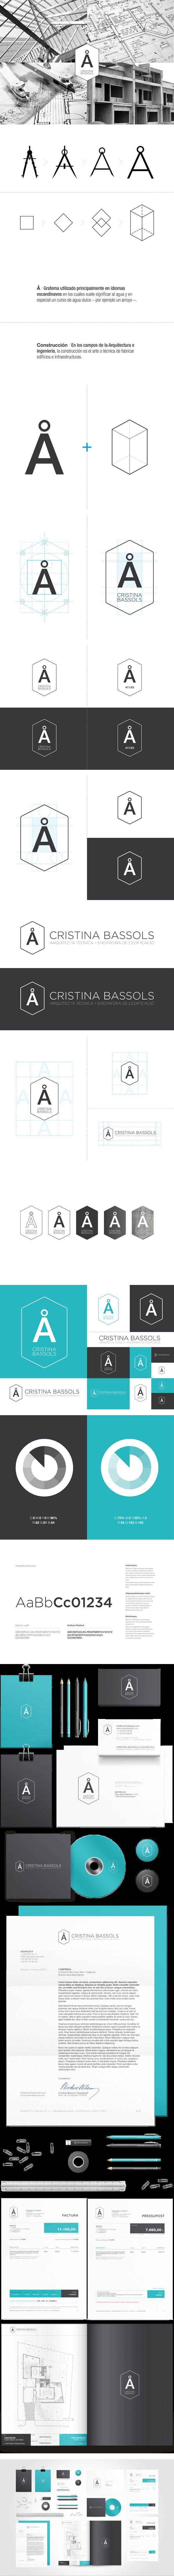 Cristina Bassols visual Identity | #stationary #corporate #design #corporatedesign #identity #branding #marketing < repinned by www.BlickeDeeler.de | Take a look at www.LogoGestaltung-Hamburg.de